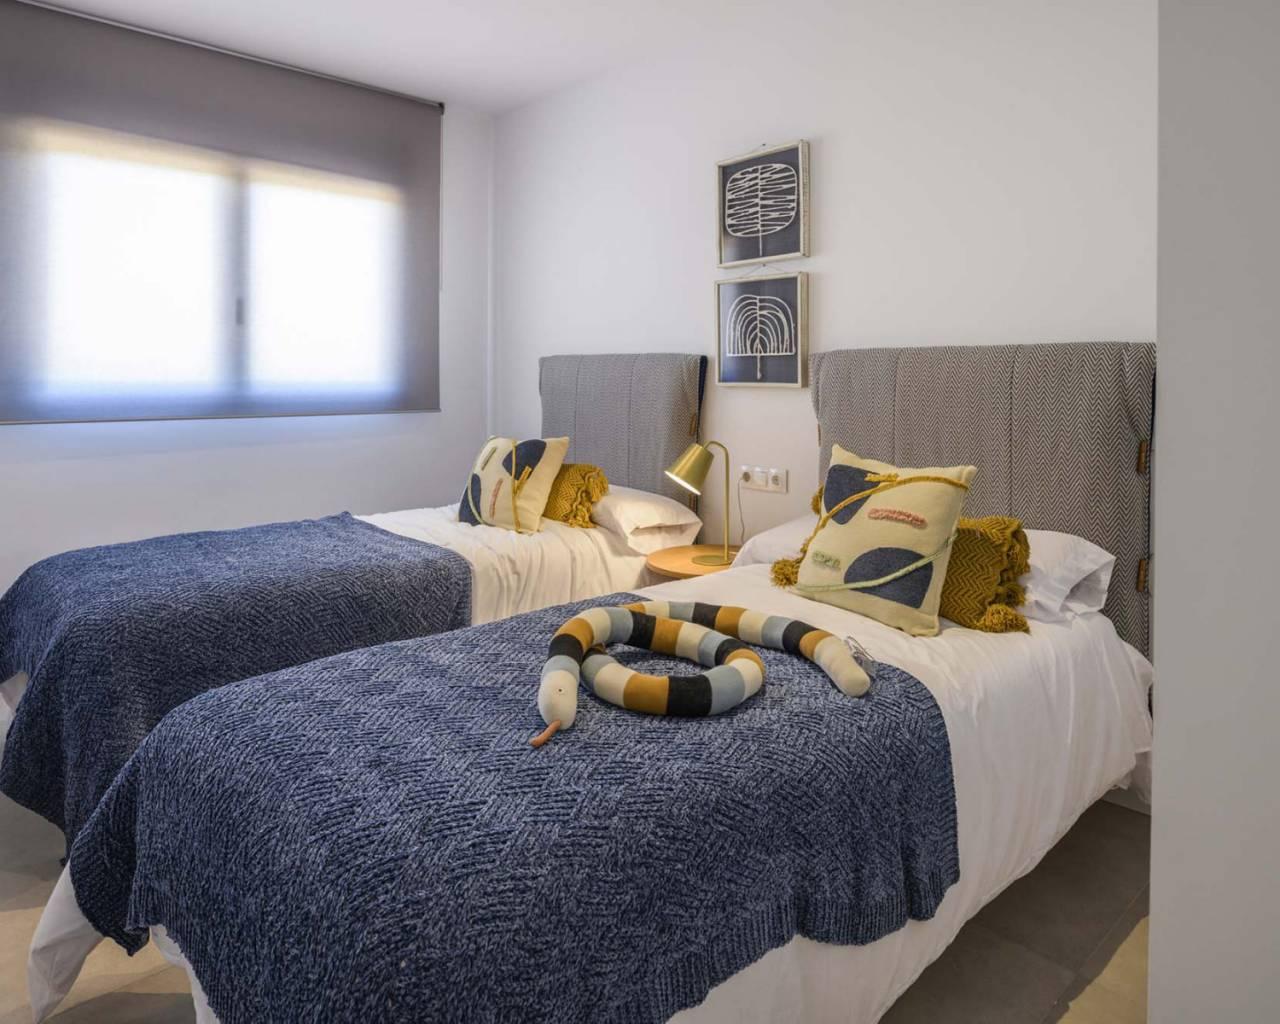 nieuwbouw-appartement-orihuela-costa-campoamor_5581_xl